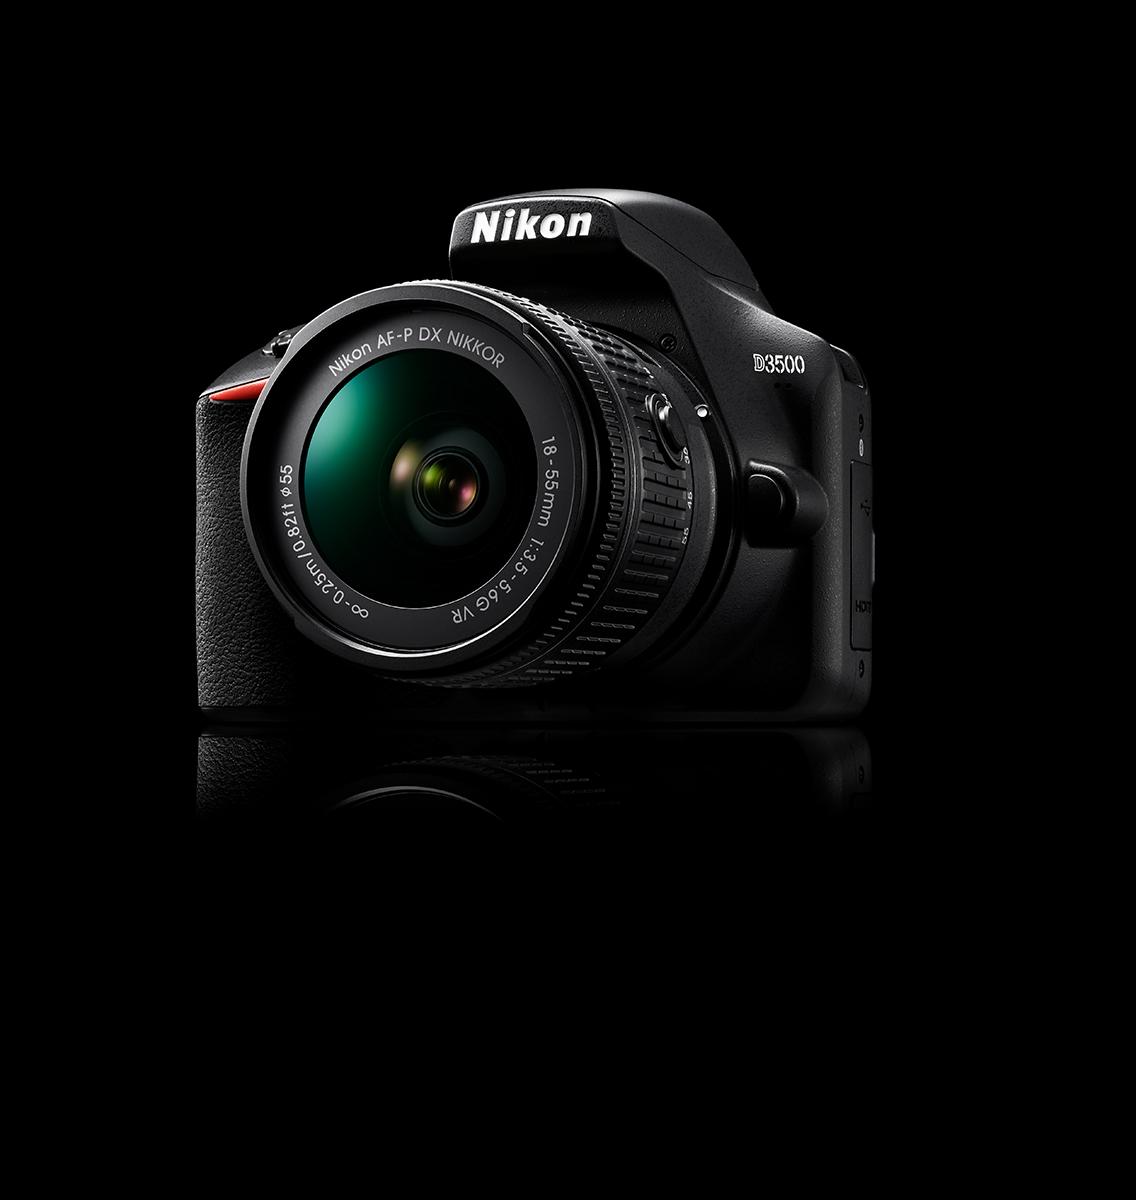 Nikon in Halle 2.2.